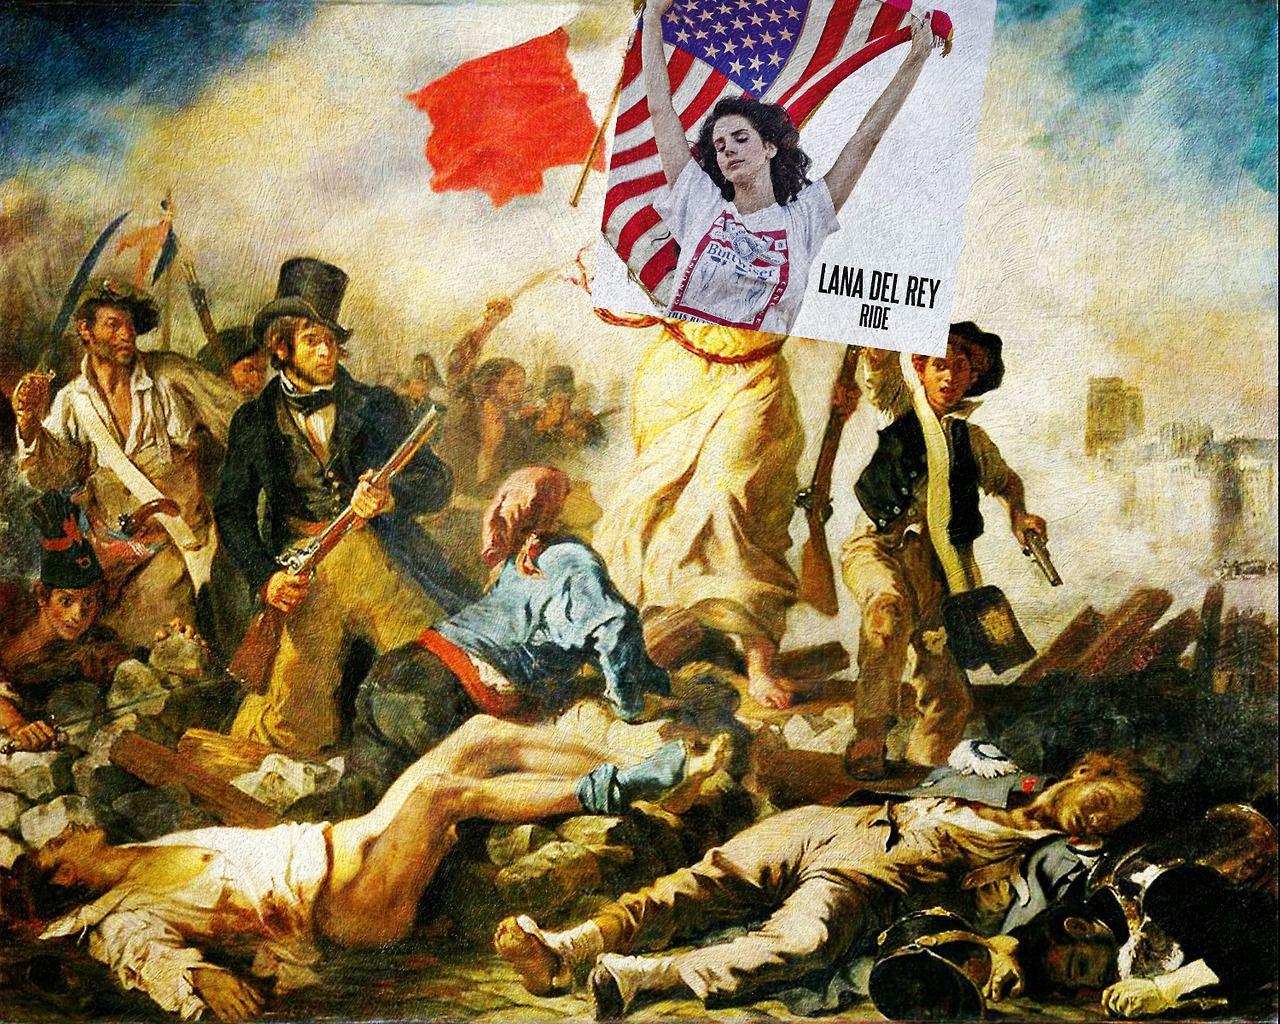 Eisenbernard I Fall Asleep In An American Flag Ride By Lana